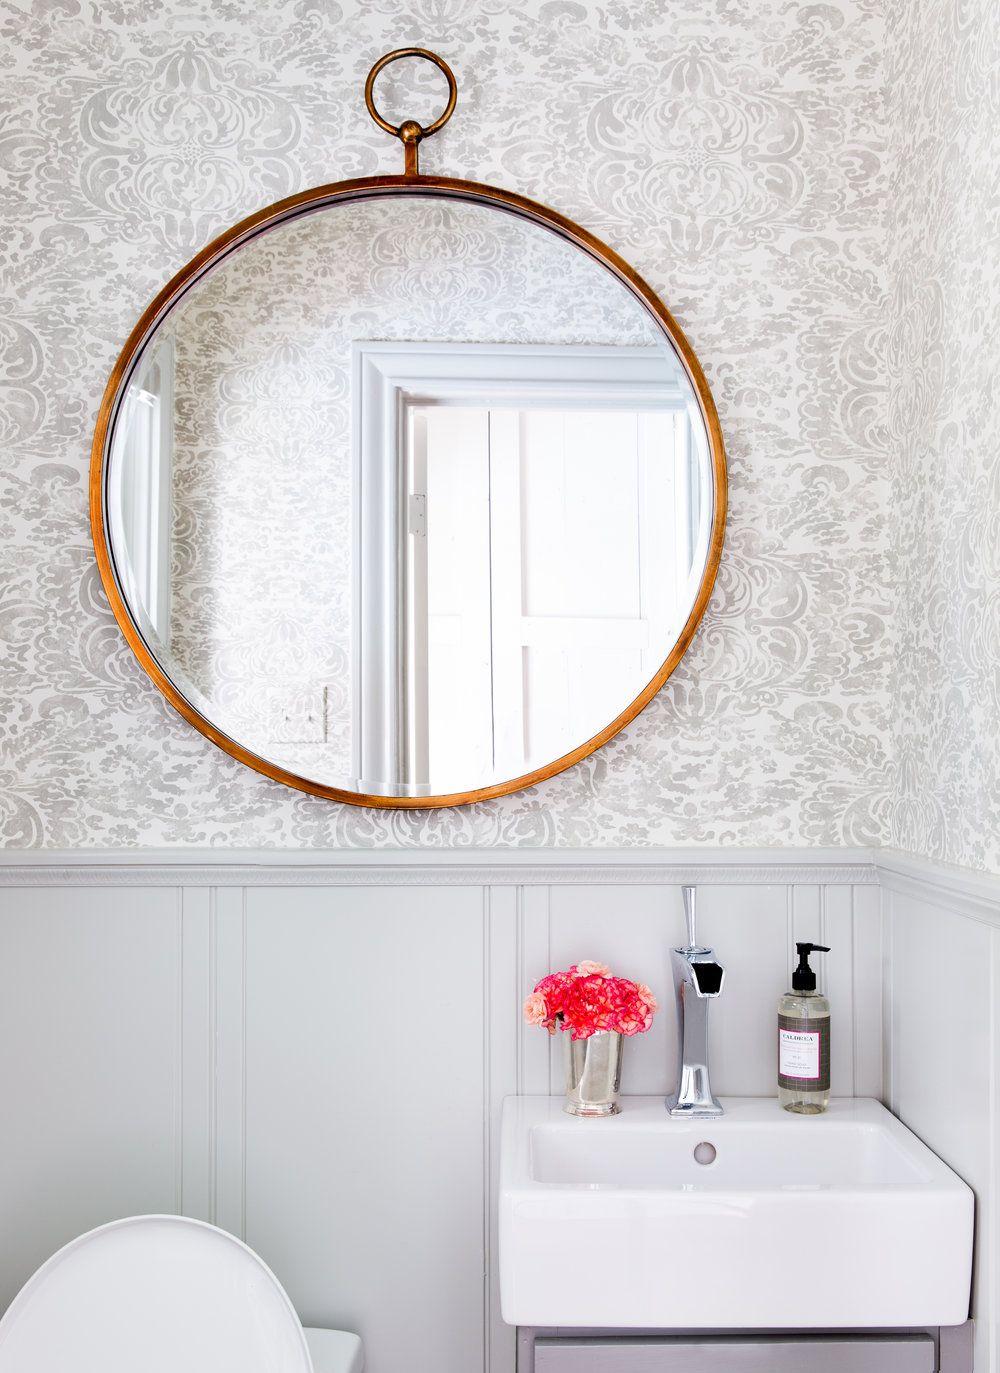 Statement Circular Mirror In Powder Room Jennifer Barron